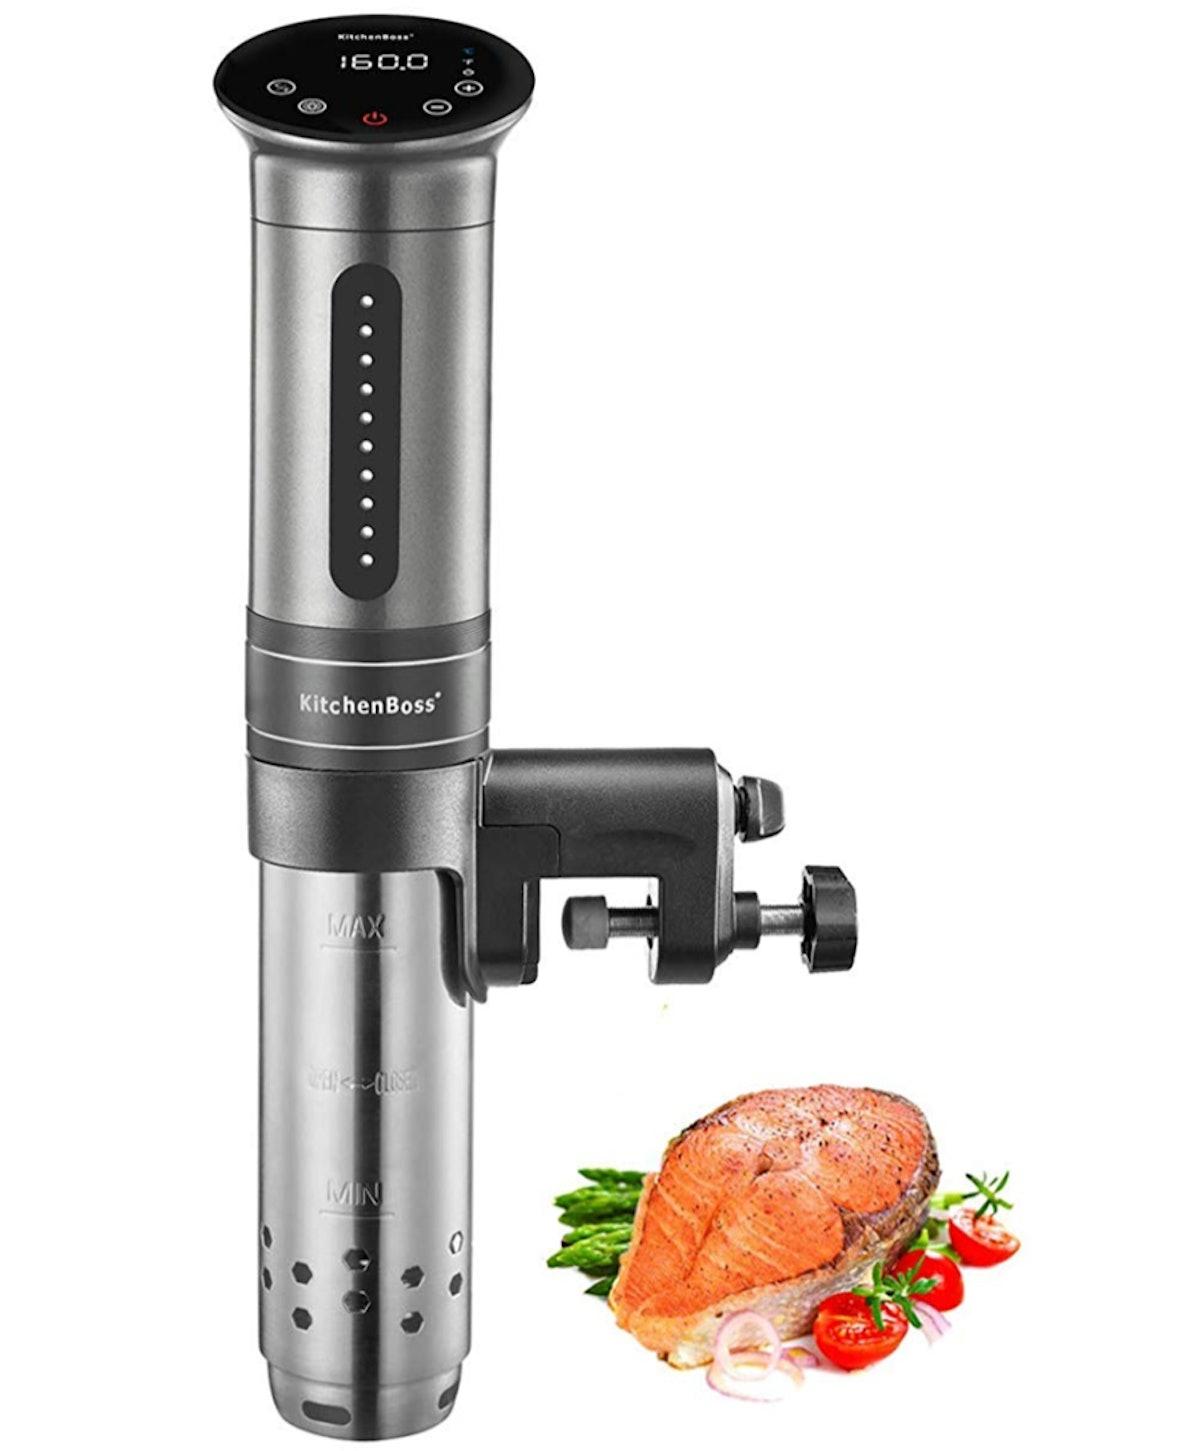 KitchenBoss 1100 Watt IPX7 Waterproof Sous Vide Cooker